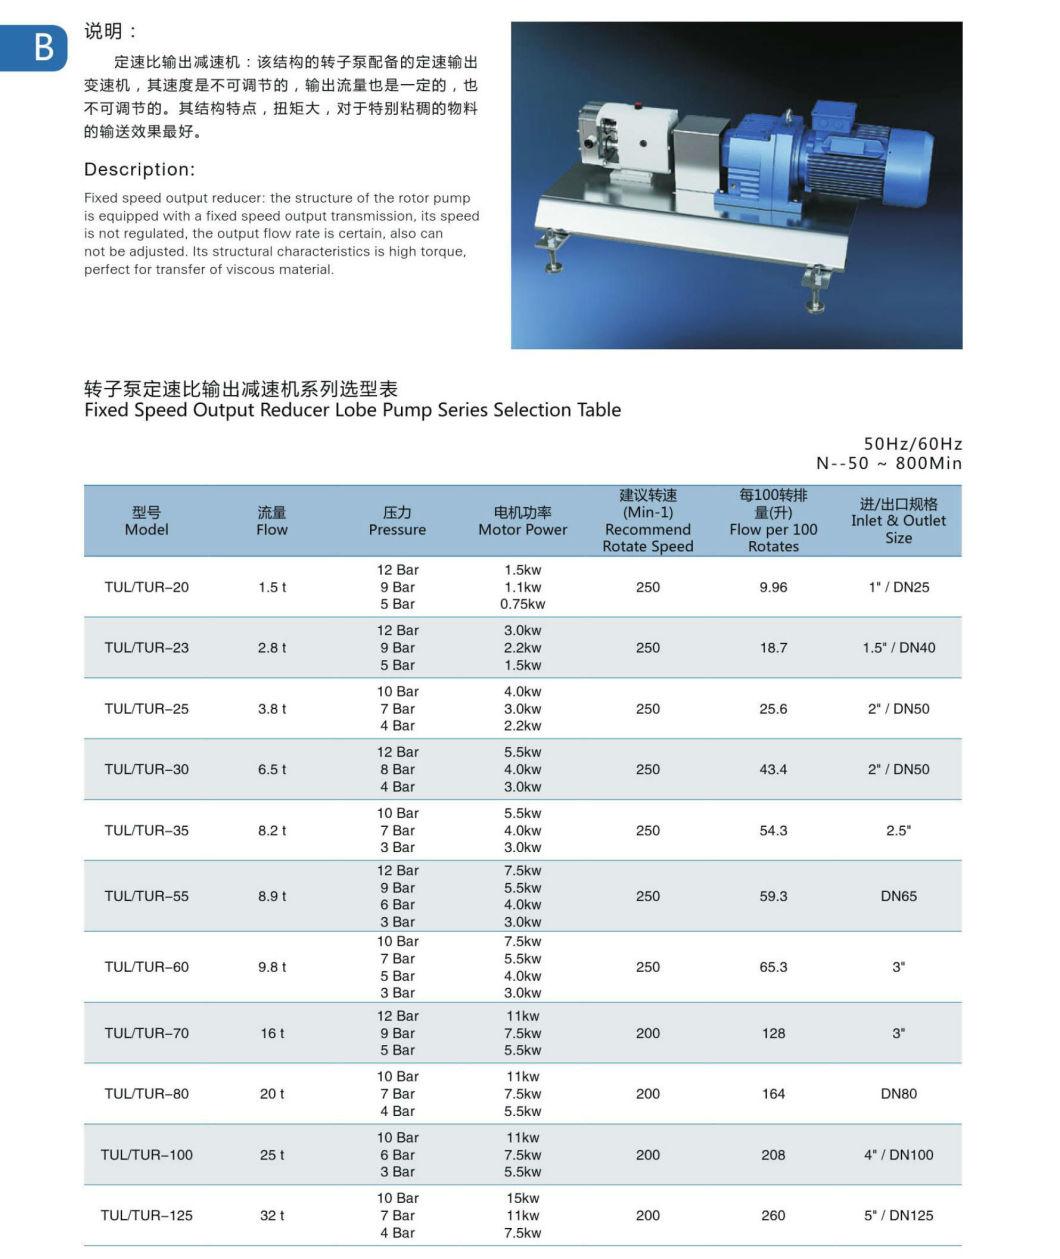 Sanitary Stainless Steel Variable Speed Rotary Lobe Vane Pump for High Viscosity